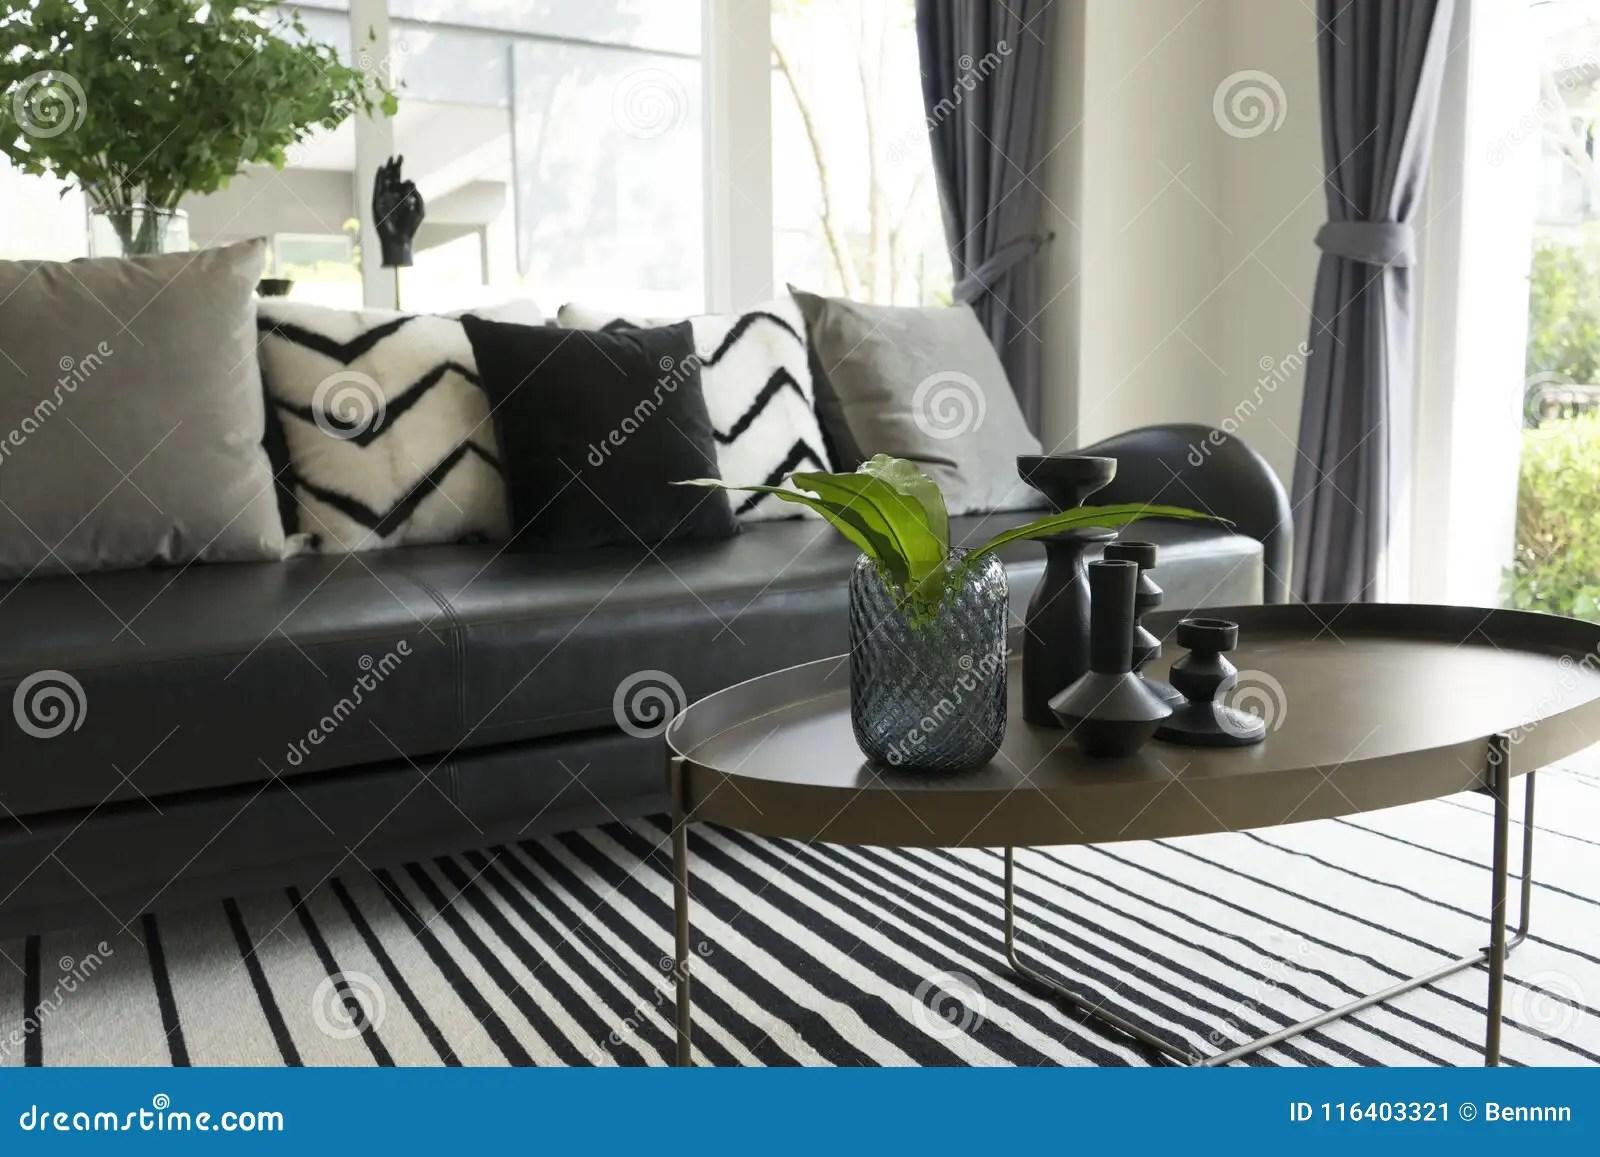 https www dreamstime com modern vase green leaf center table black white pillows sofa background image116403321